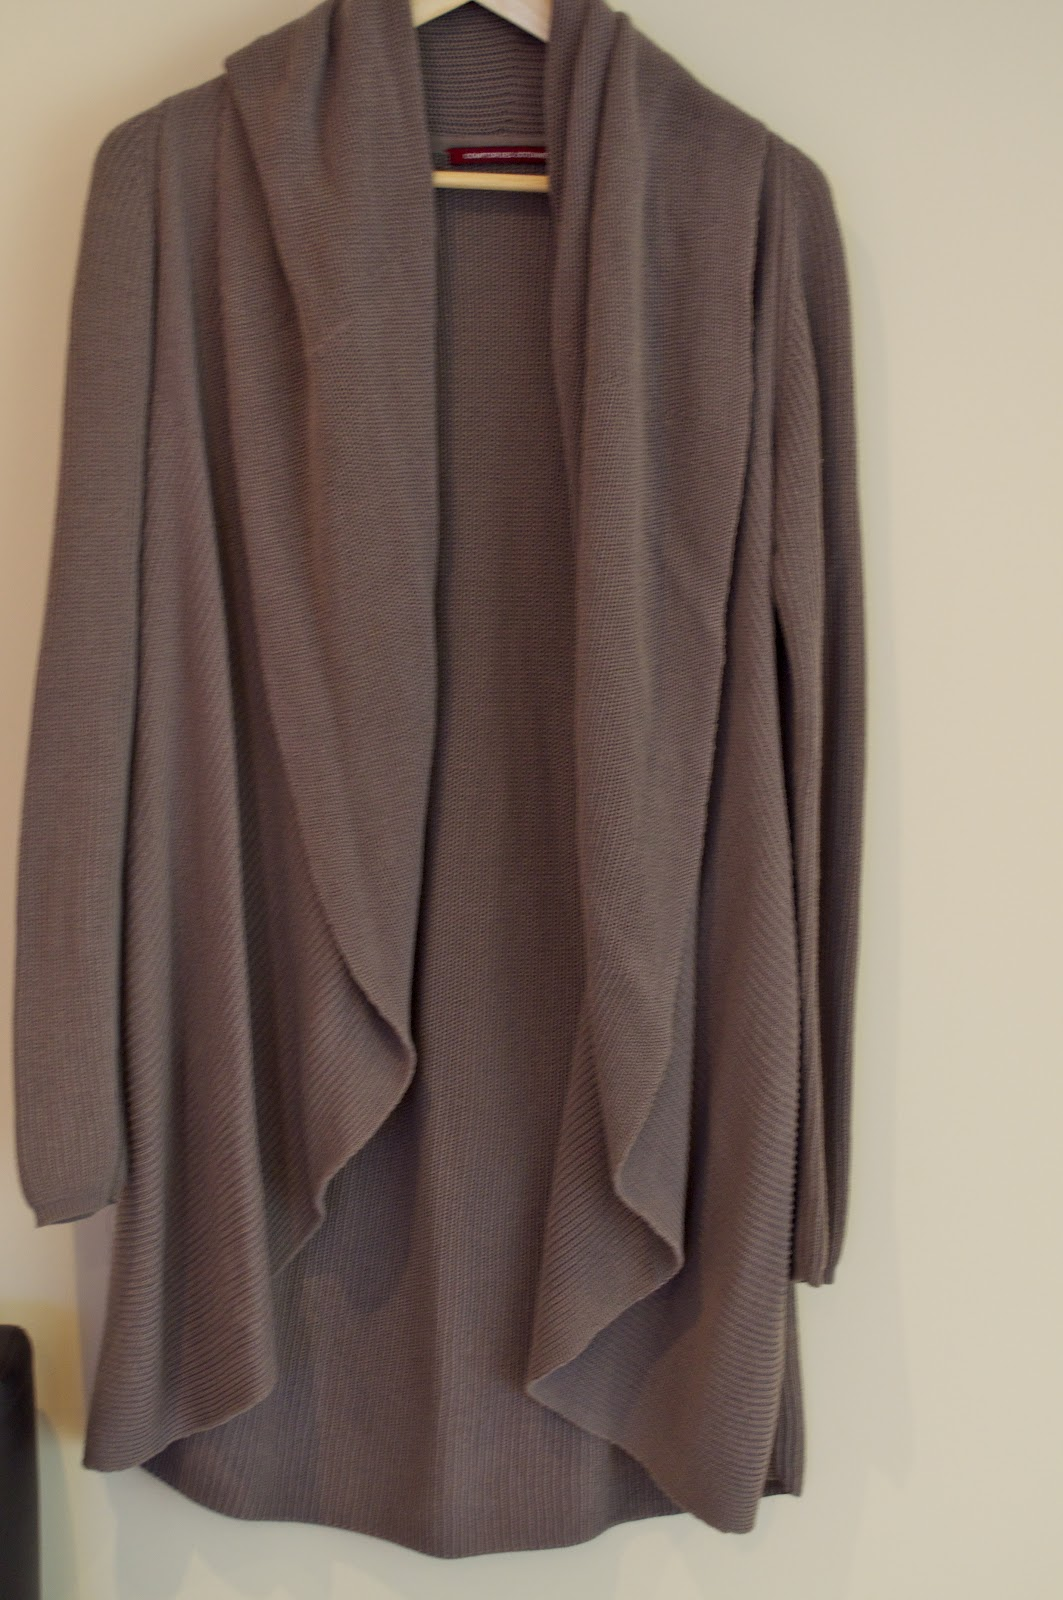 Mon vide dressing gilet long taupe comptoir des - Vide dressing comptoir des cotonniers ...